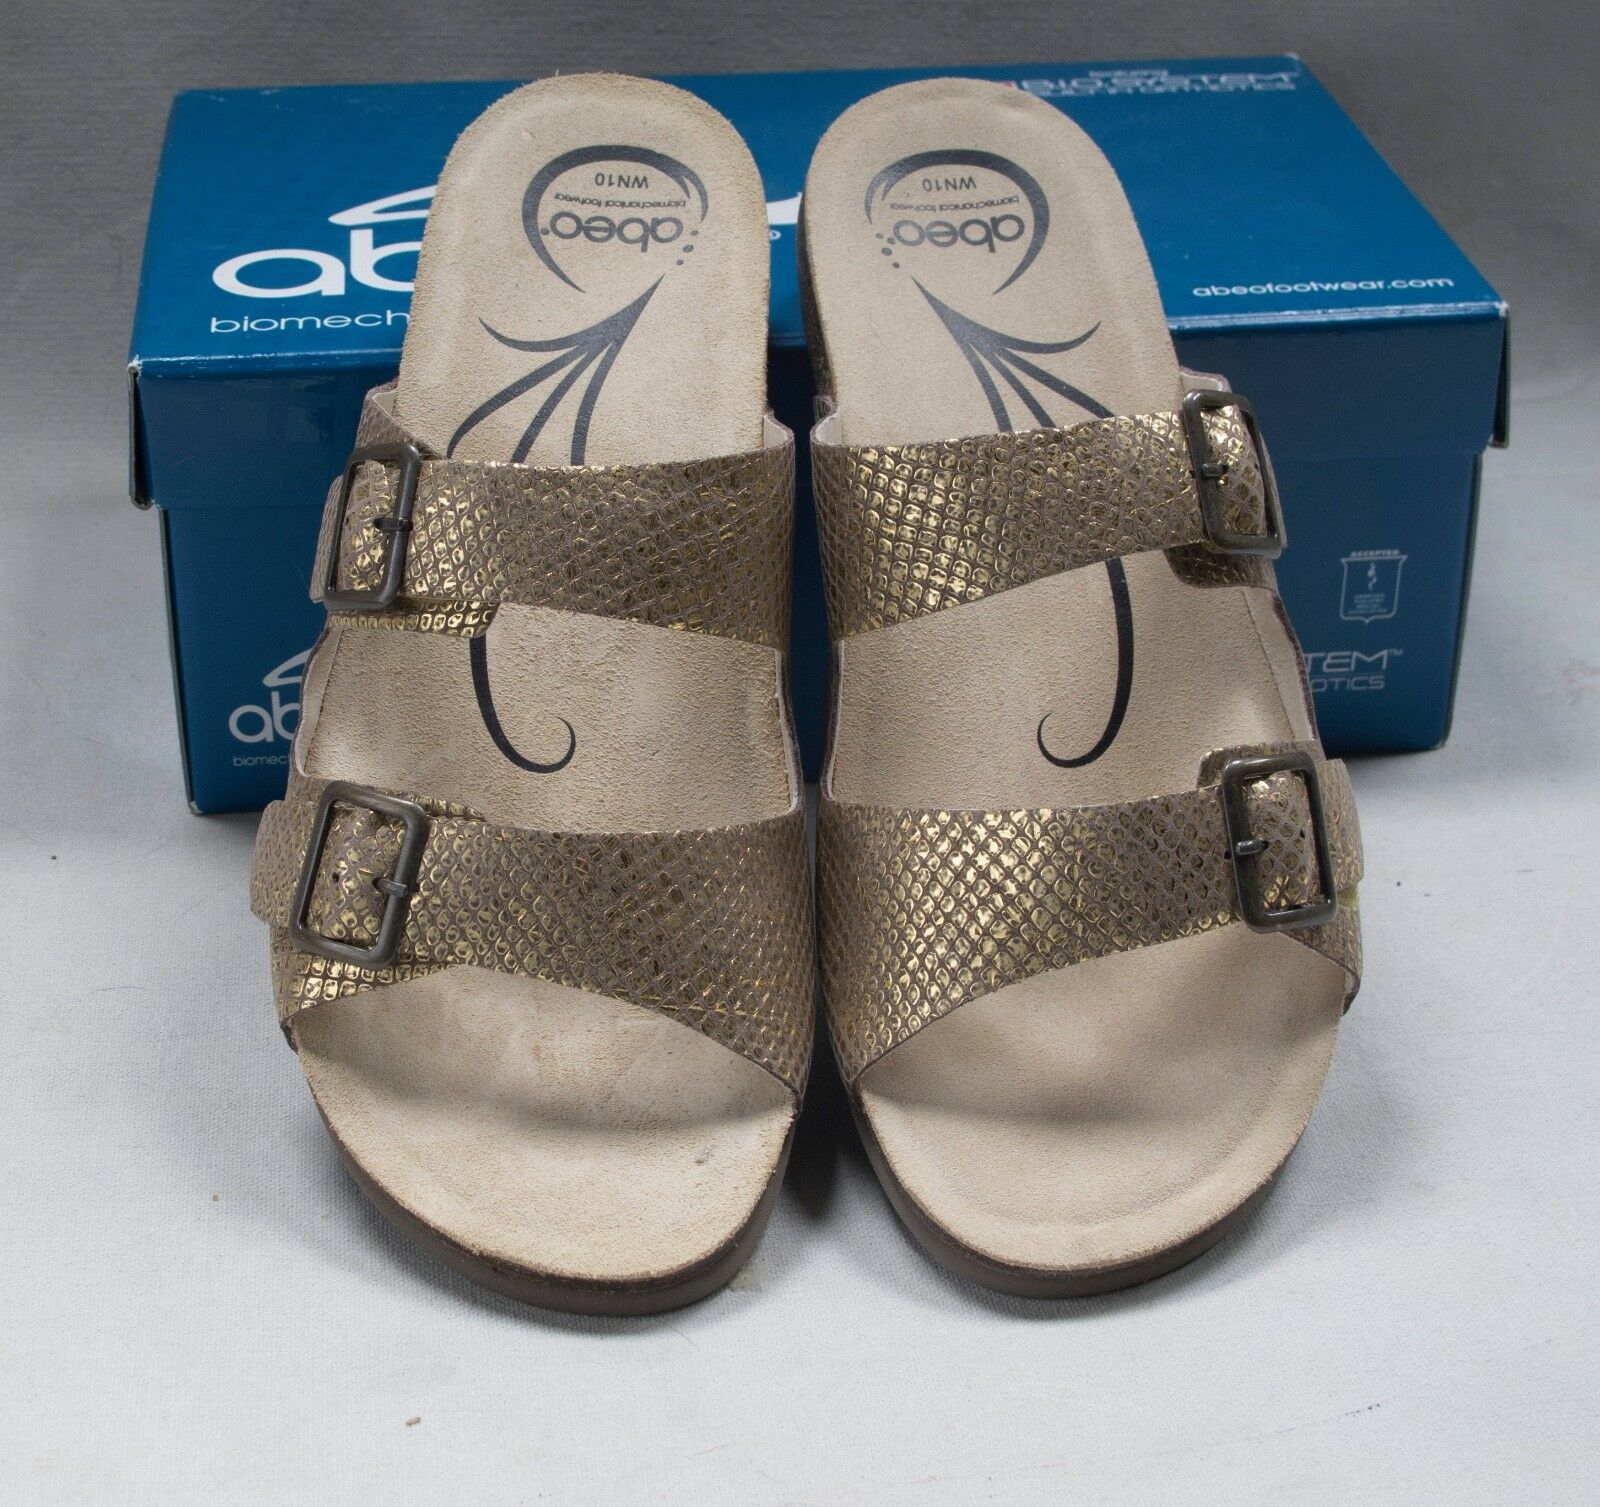 NIB Donna  abeo  Blythe  oro Sandal Sandal Sandal Dimensione 10 Narrow 27722c